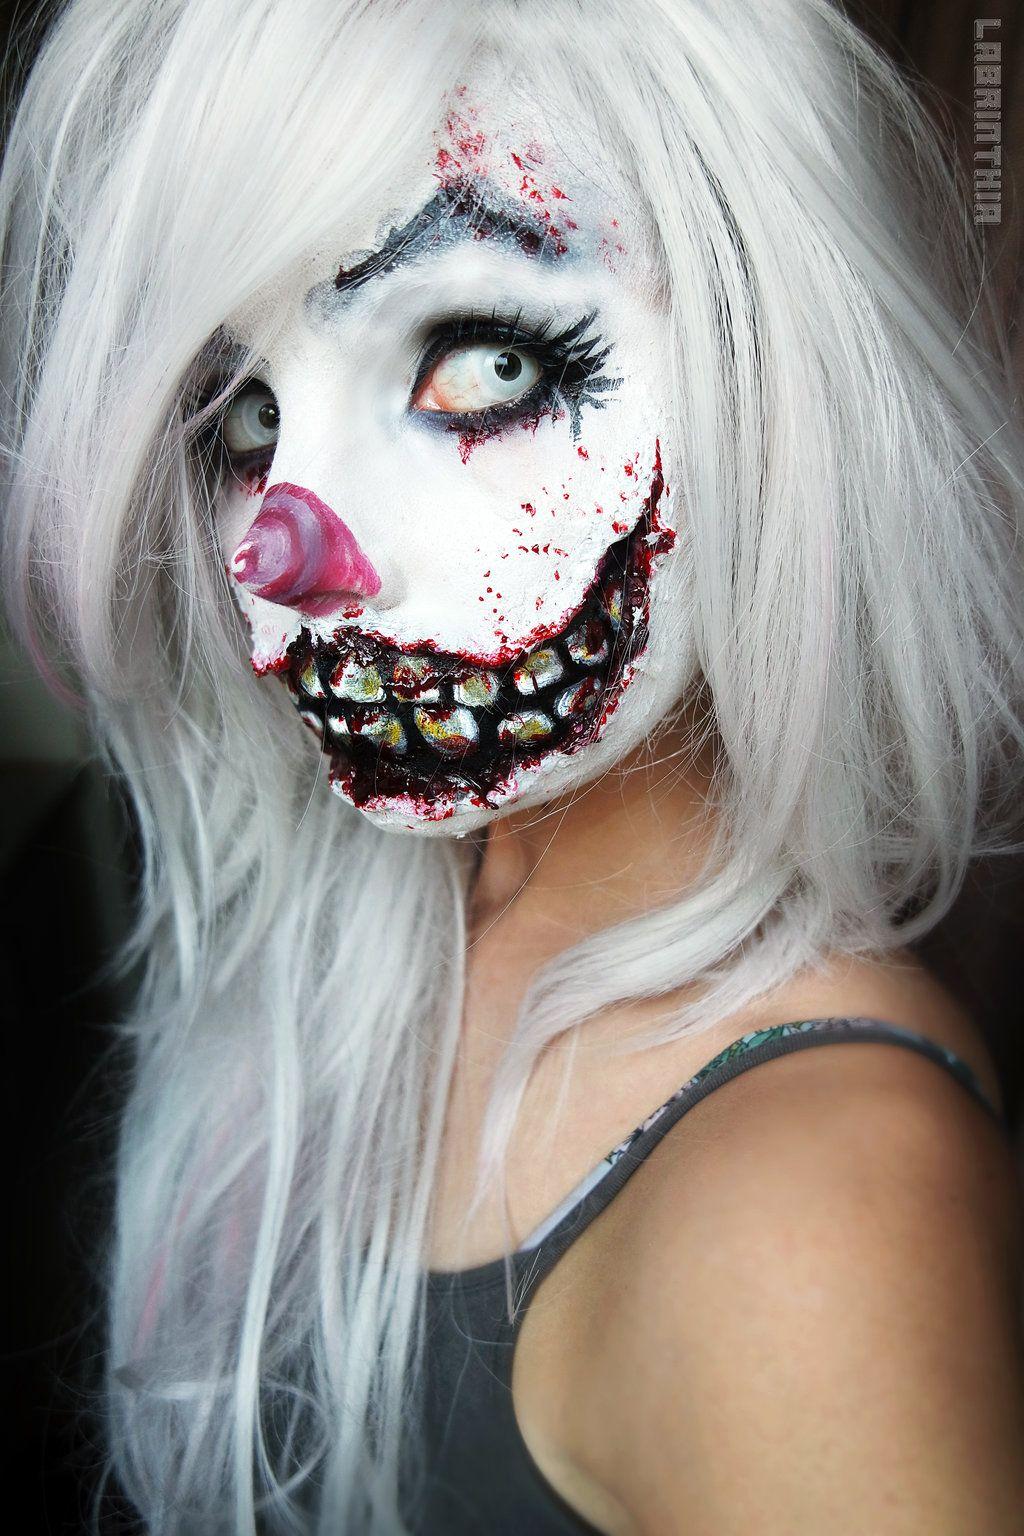 Creepy clown girl by on for Clown schminktipps